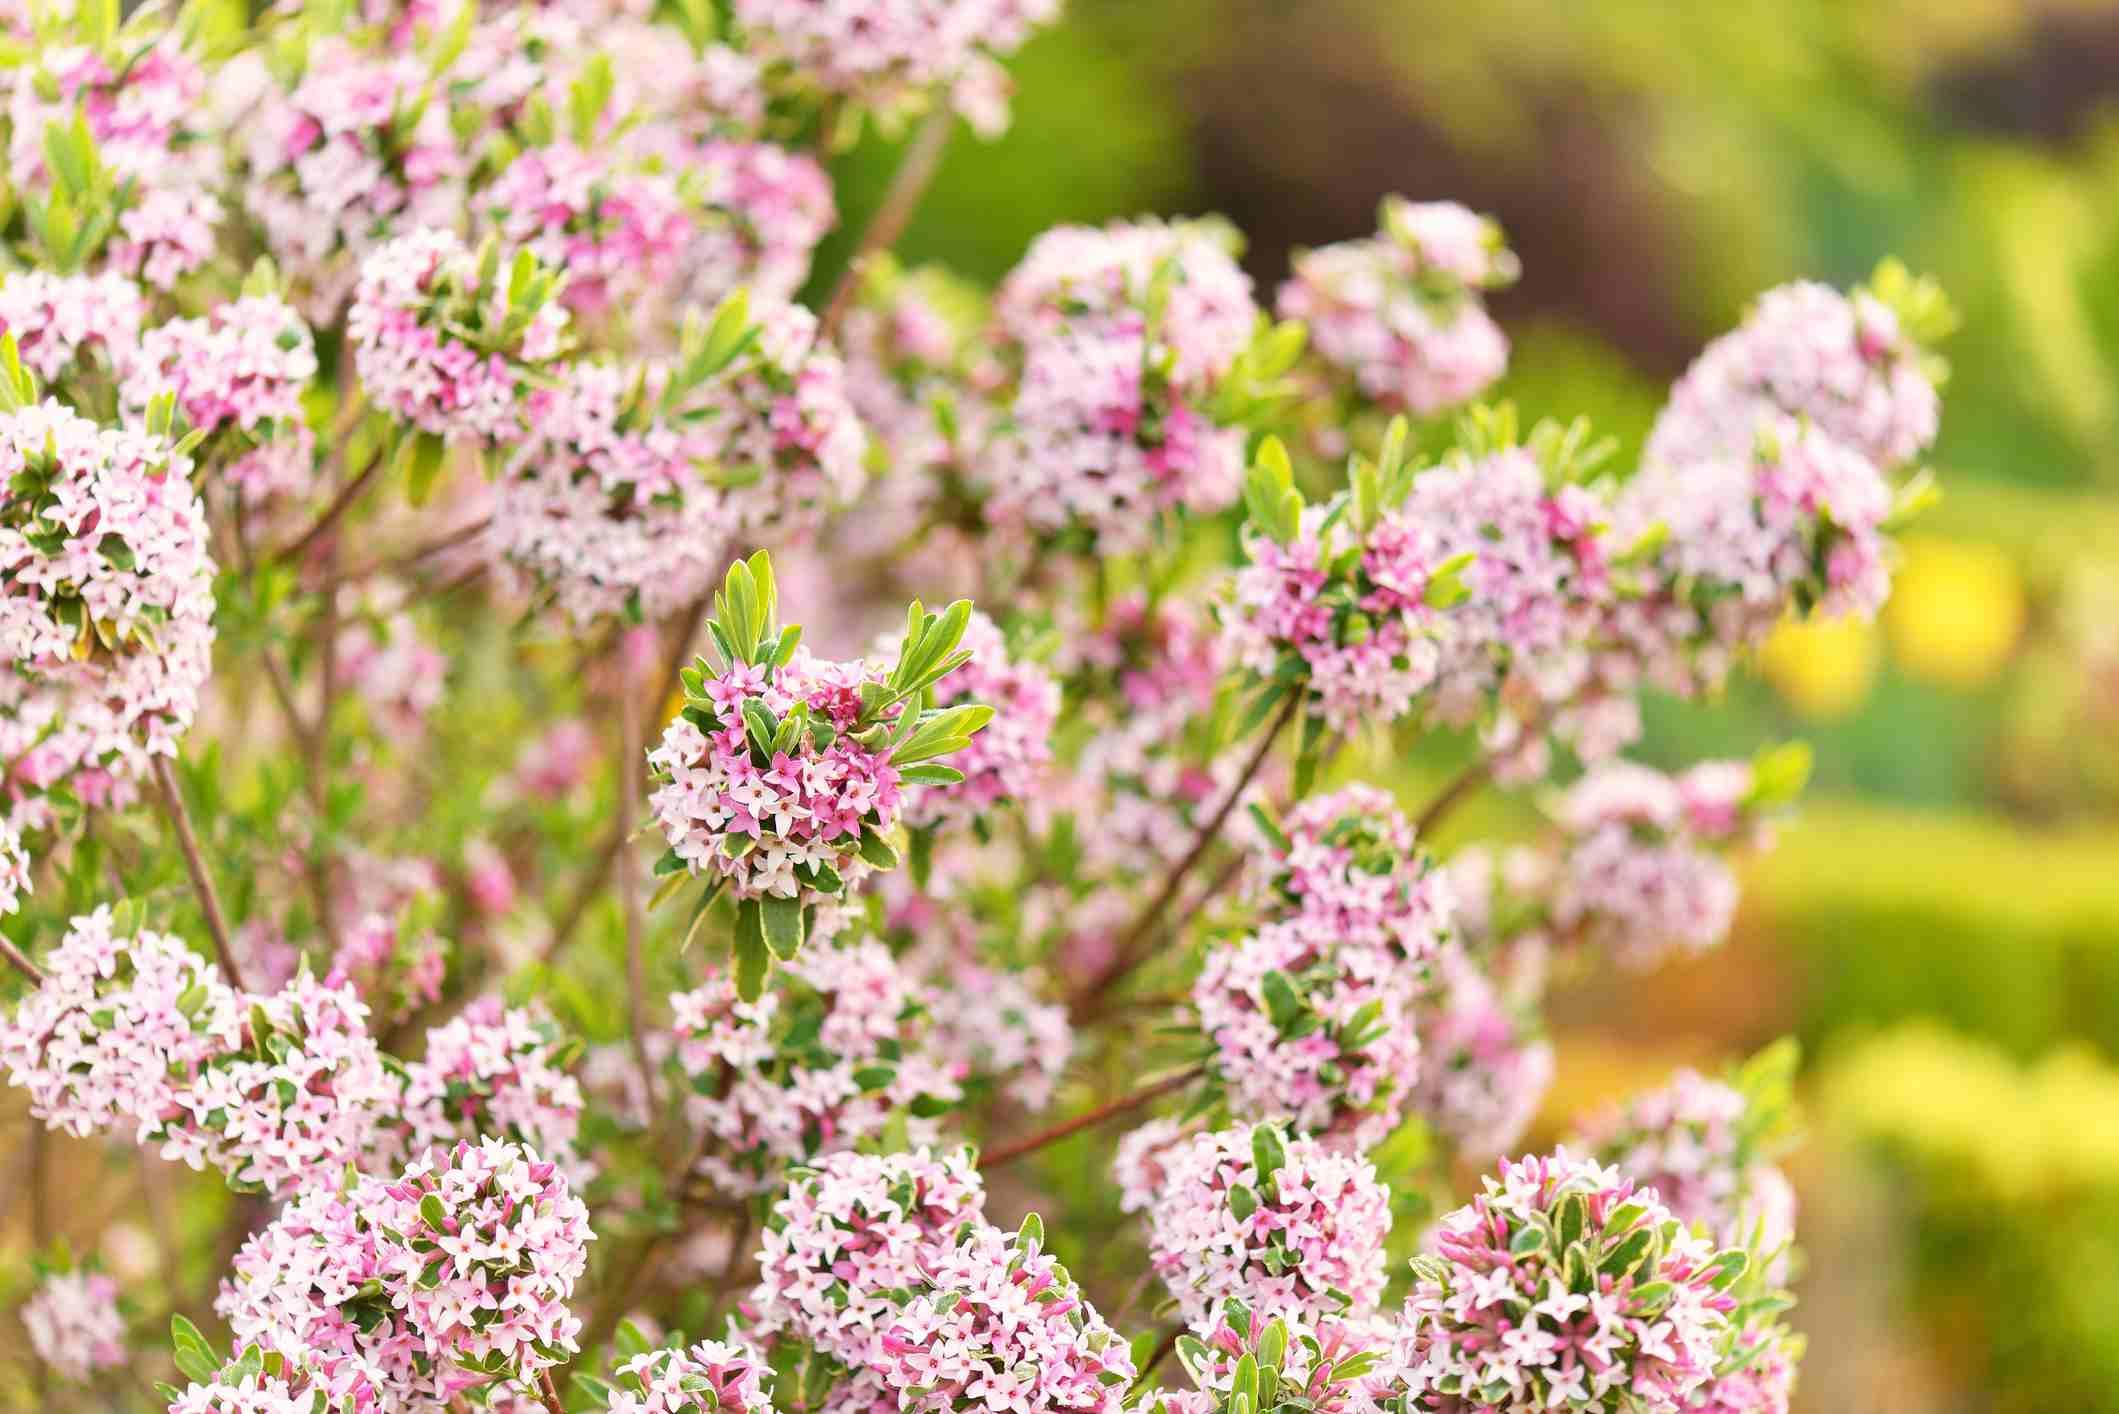 Carole Mackie flowering shrub